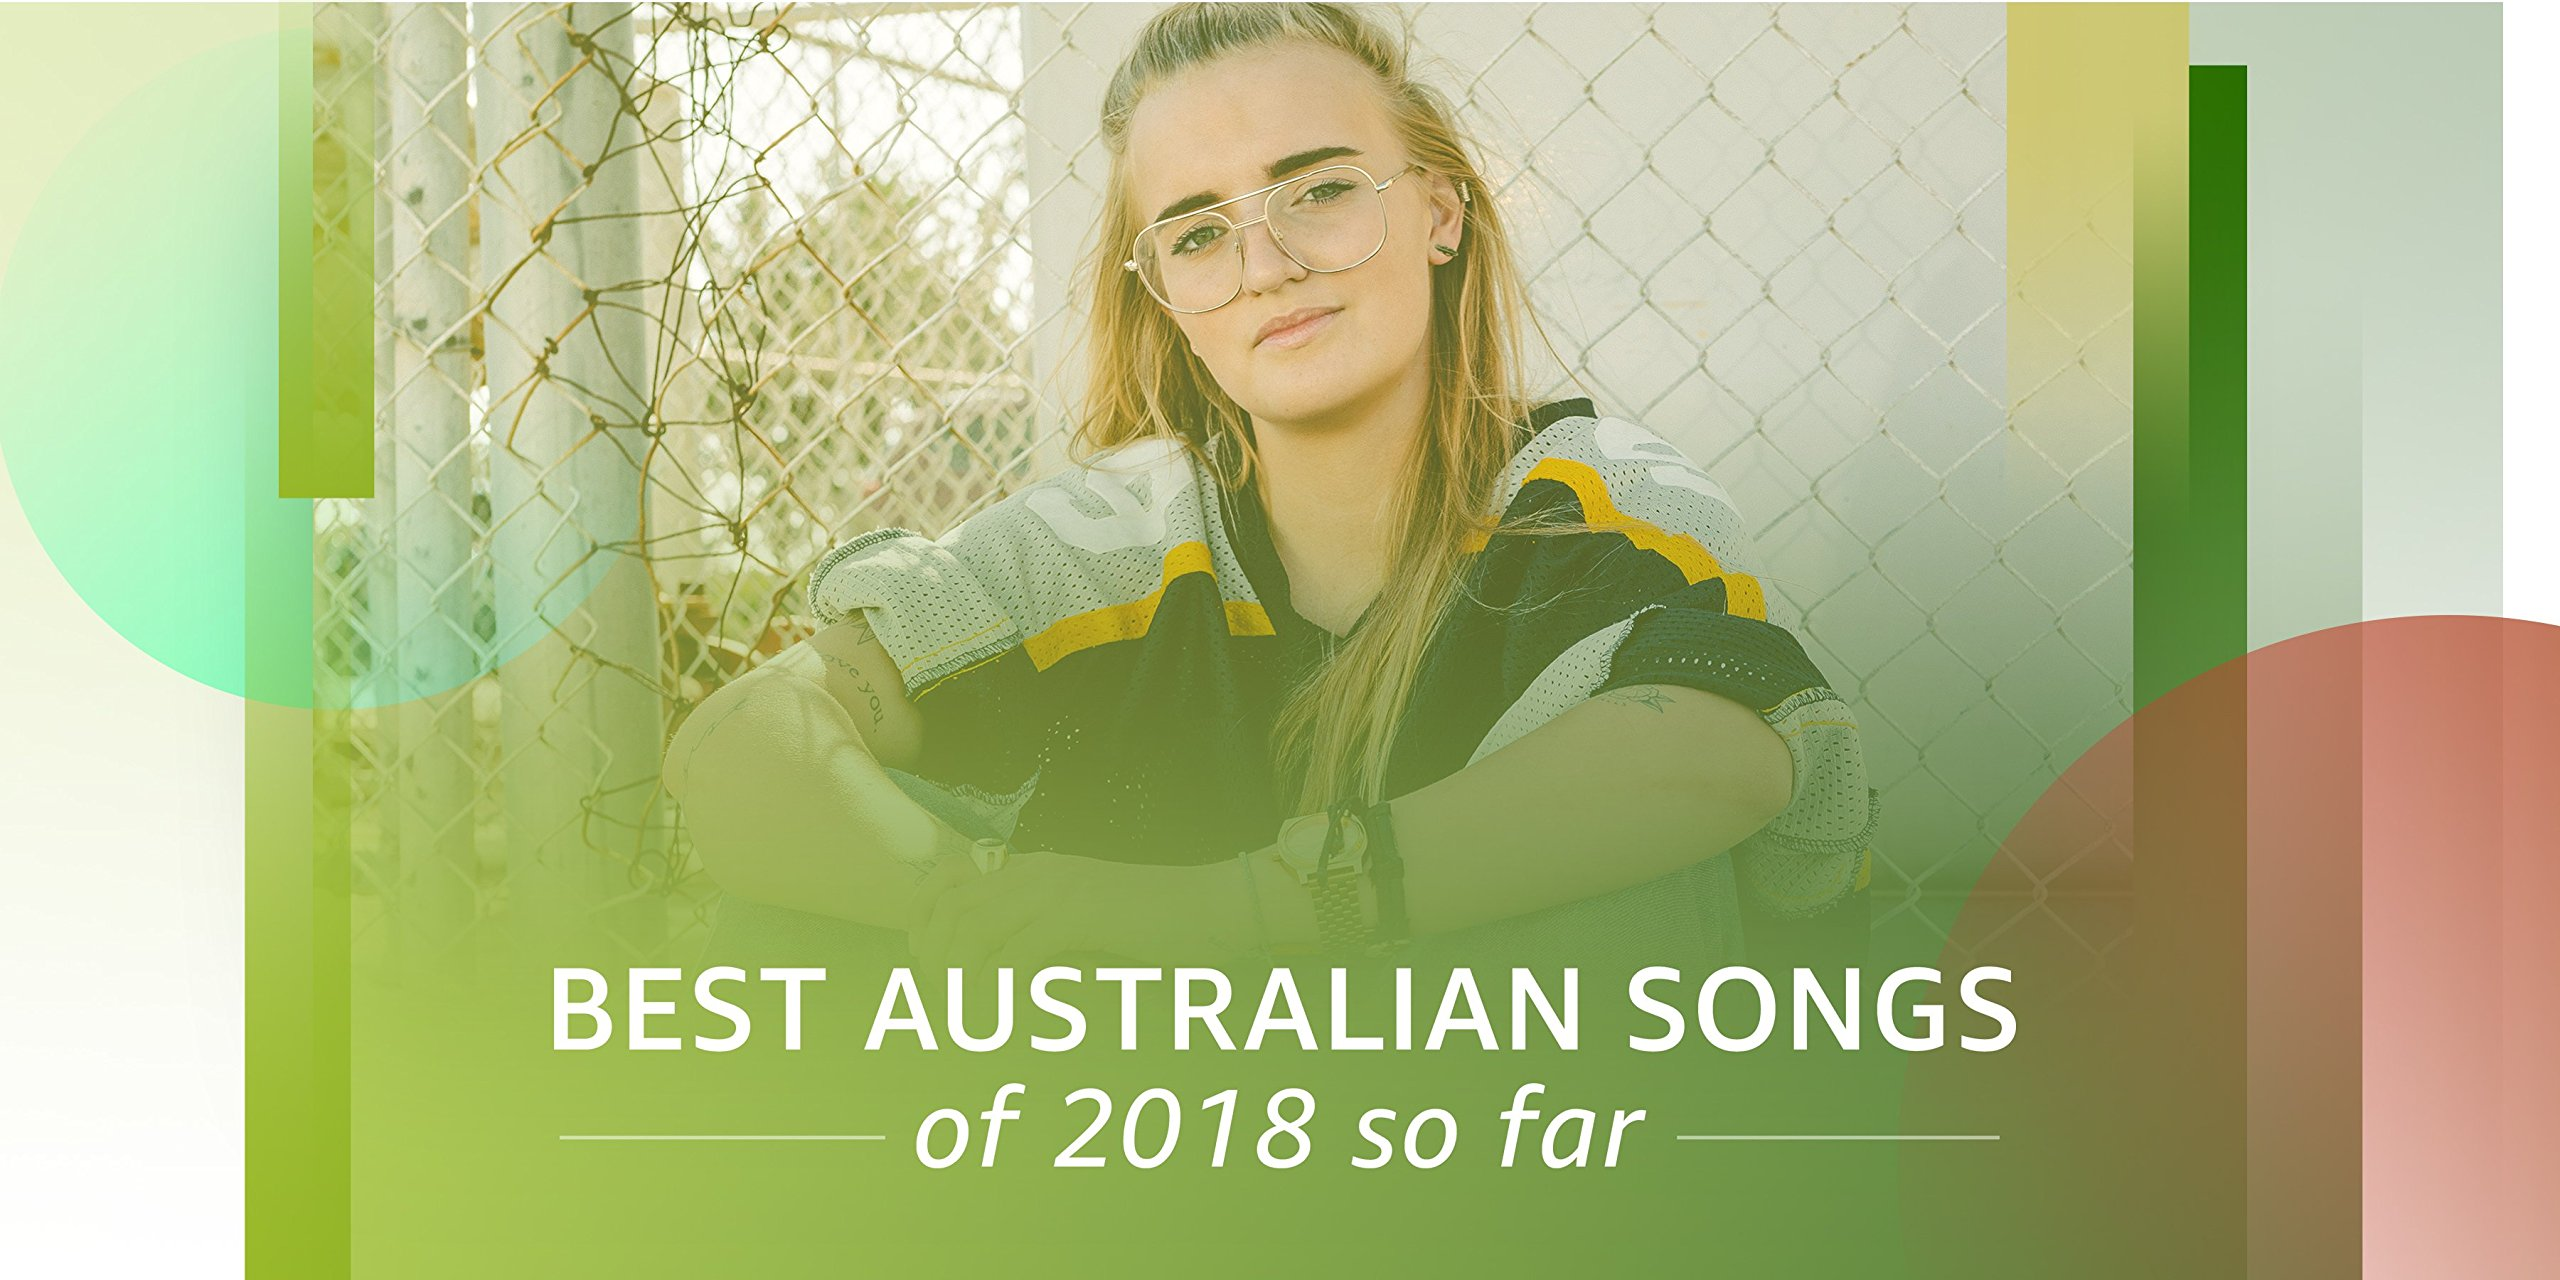 Best Australian Songs of 2018 So Far